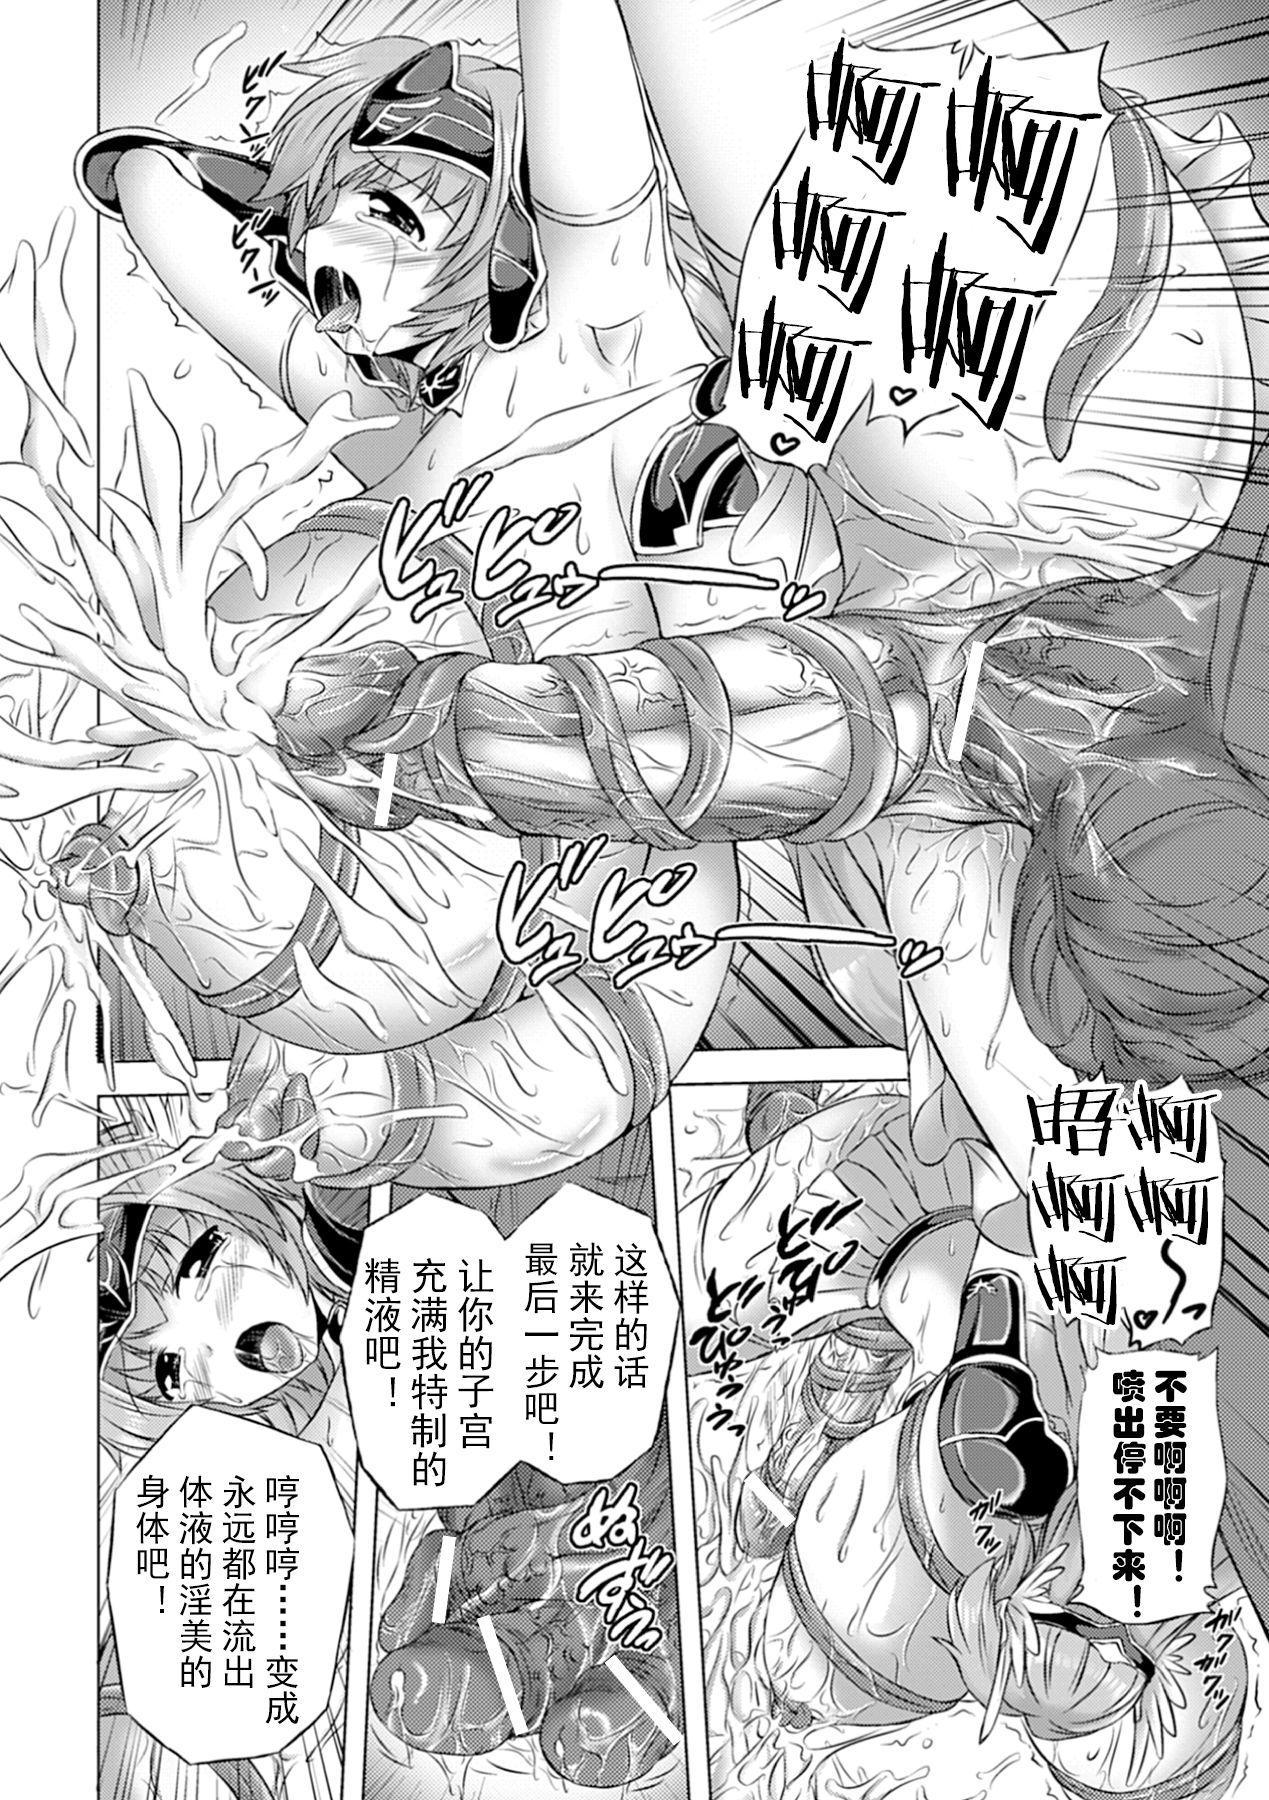 Jintai Kaizou Anthology Comics Vol. 1 18